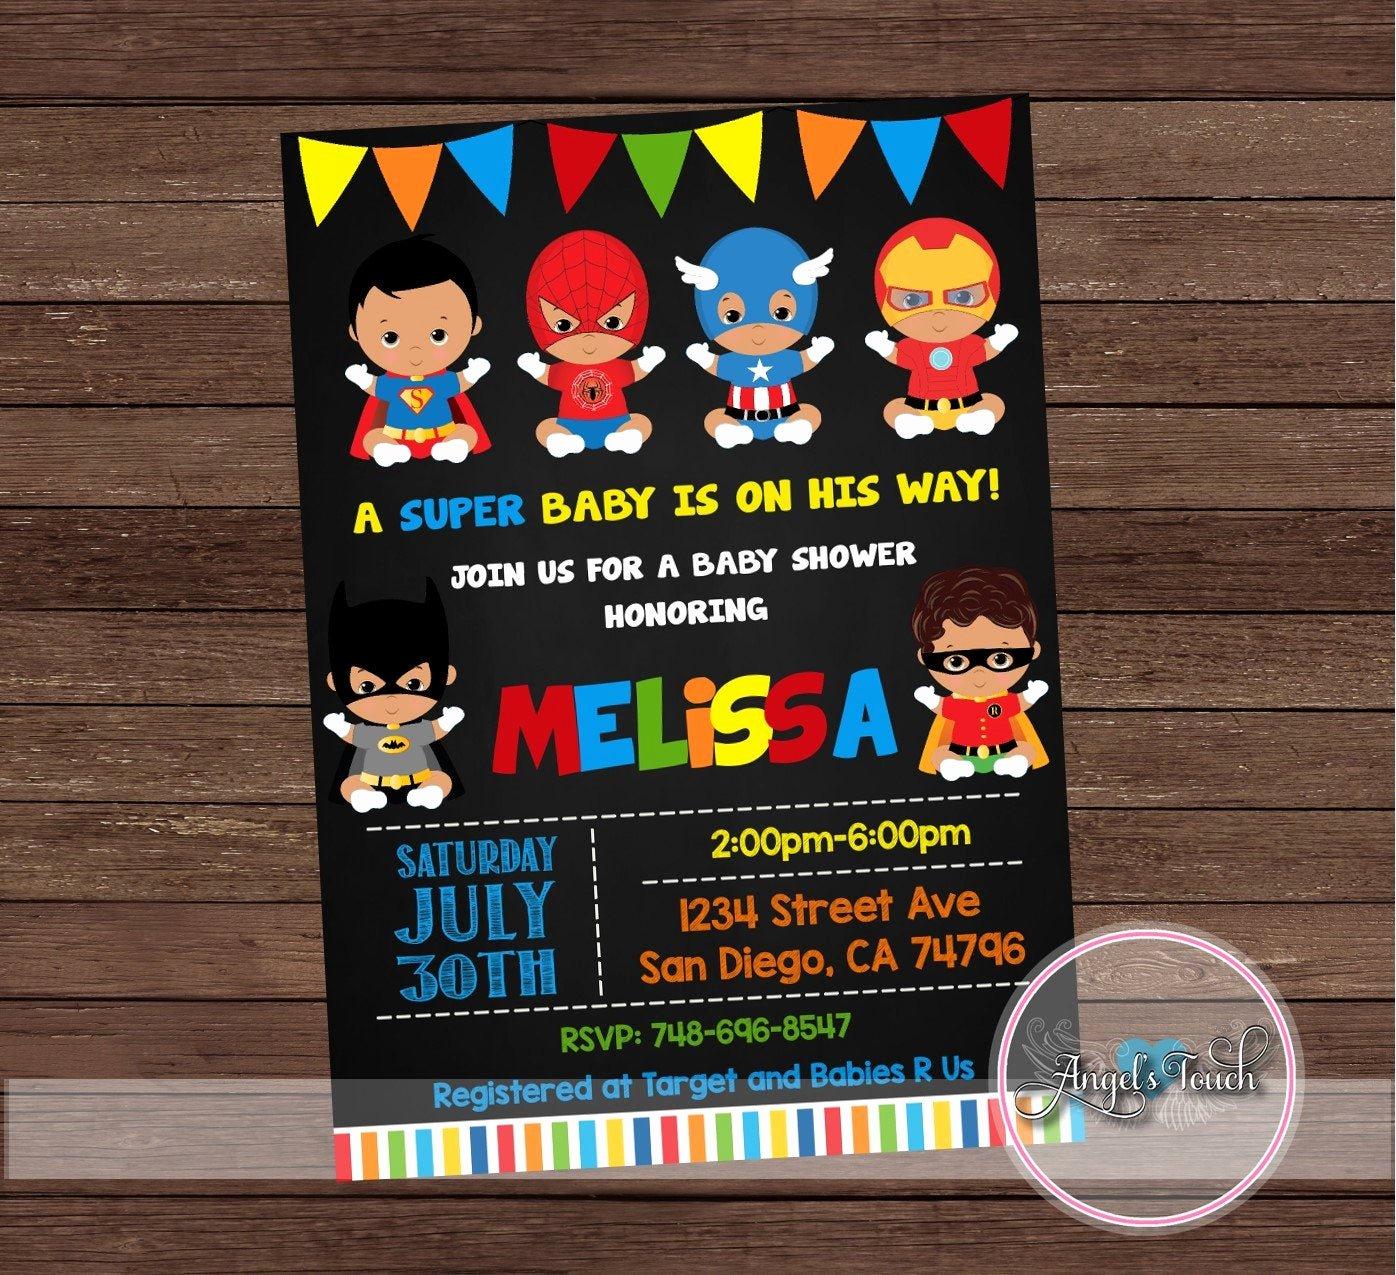 Superhero Baby Shower Invitations Free Elegant African American Superhero Baby Shower Invitation Superheroes